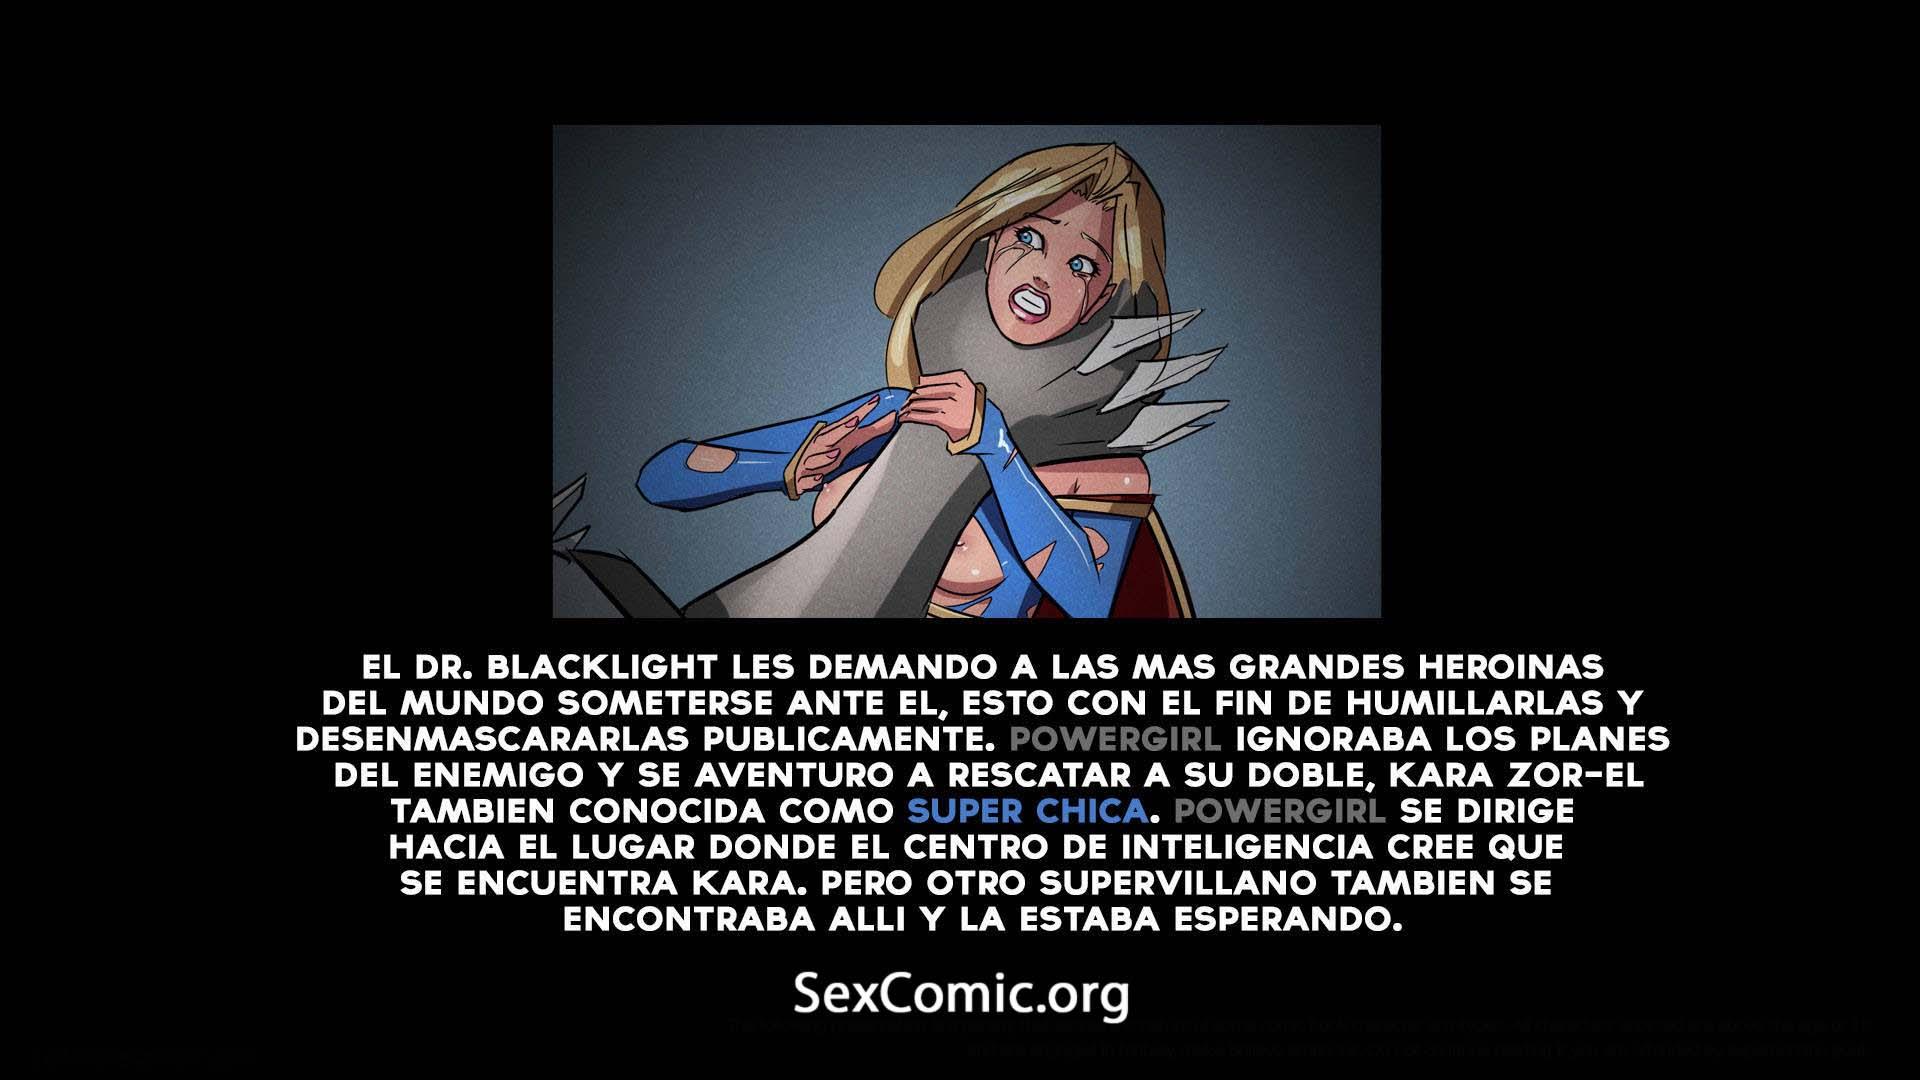 comic-marverl-xxx-atrapando-ala-famosa-powergirl-historias-eroticas-mangas-para-adultos-fantasias-sexuales-videos-incesto-comics-zoofilia-hentai-gratis-online-2